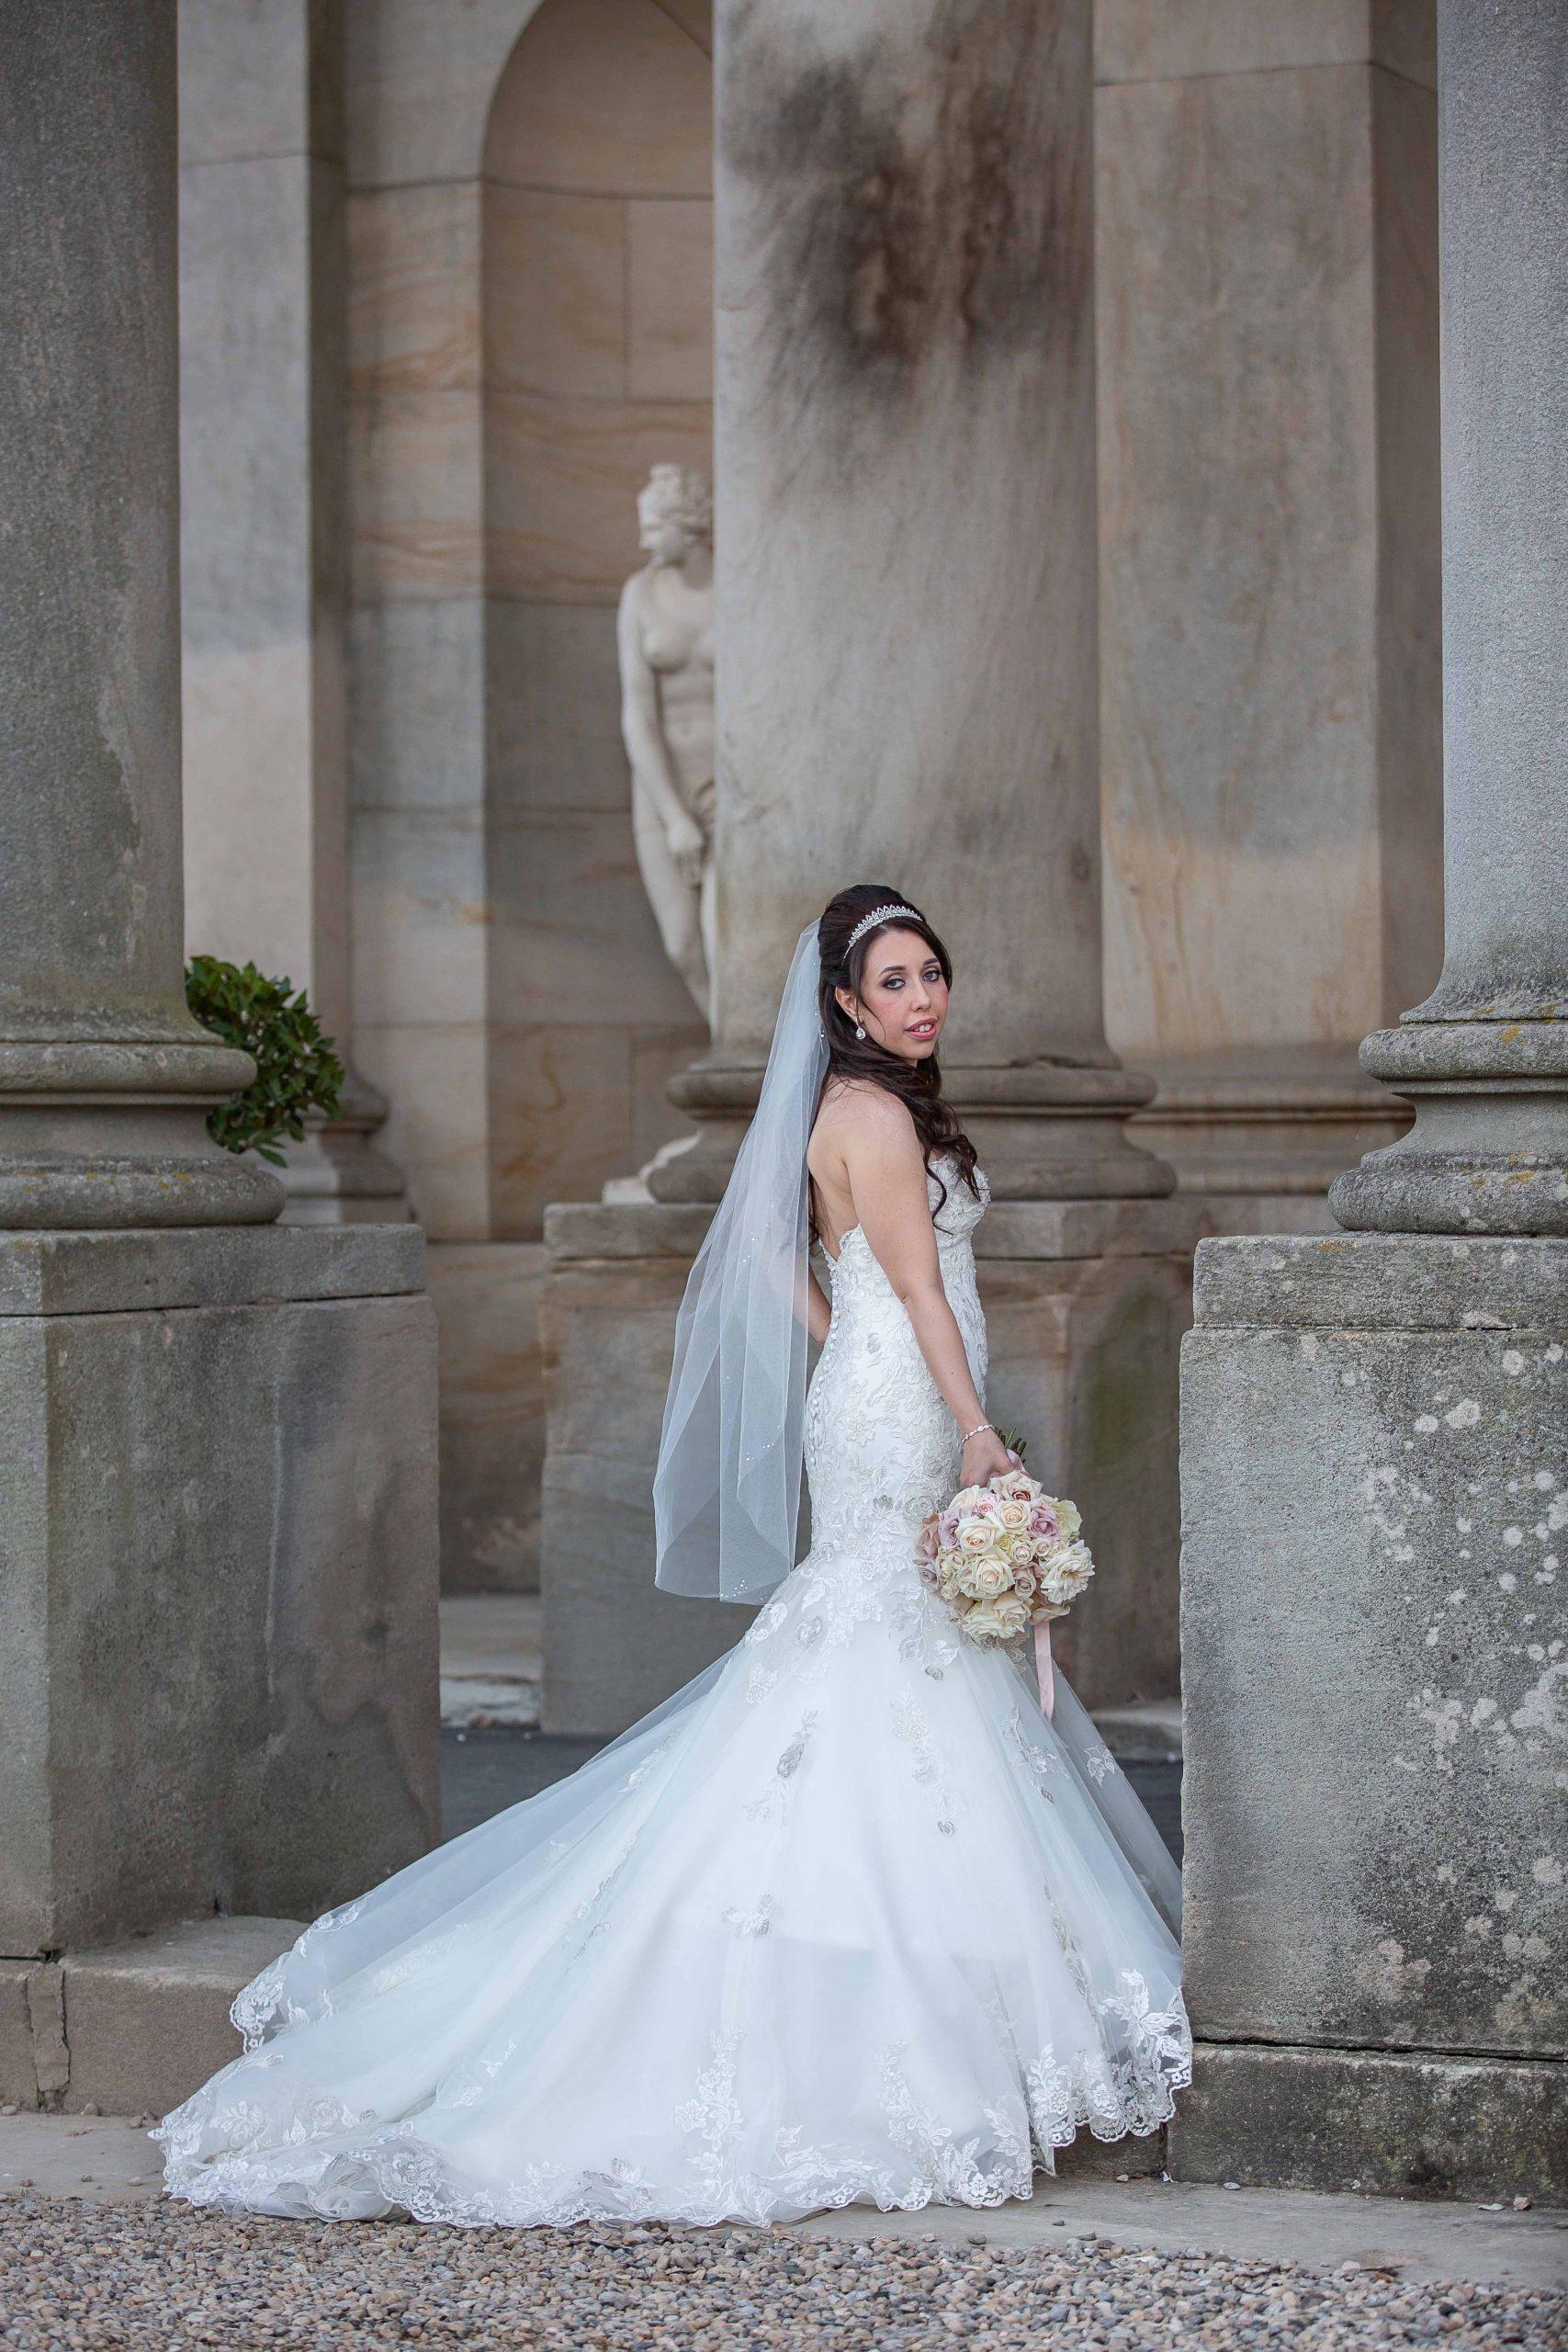 Durham wedding photographers, Teardrop Photography at Wynyard Hall